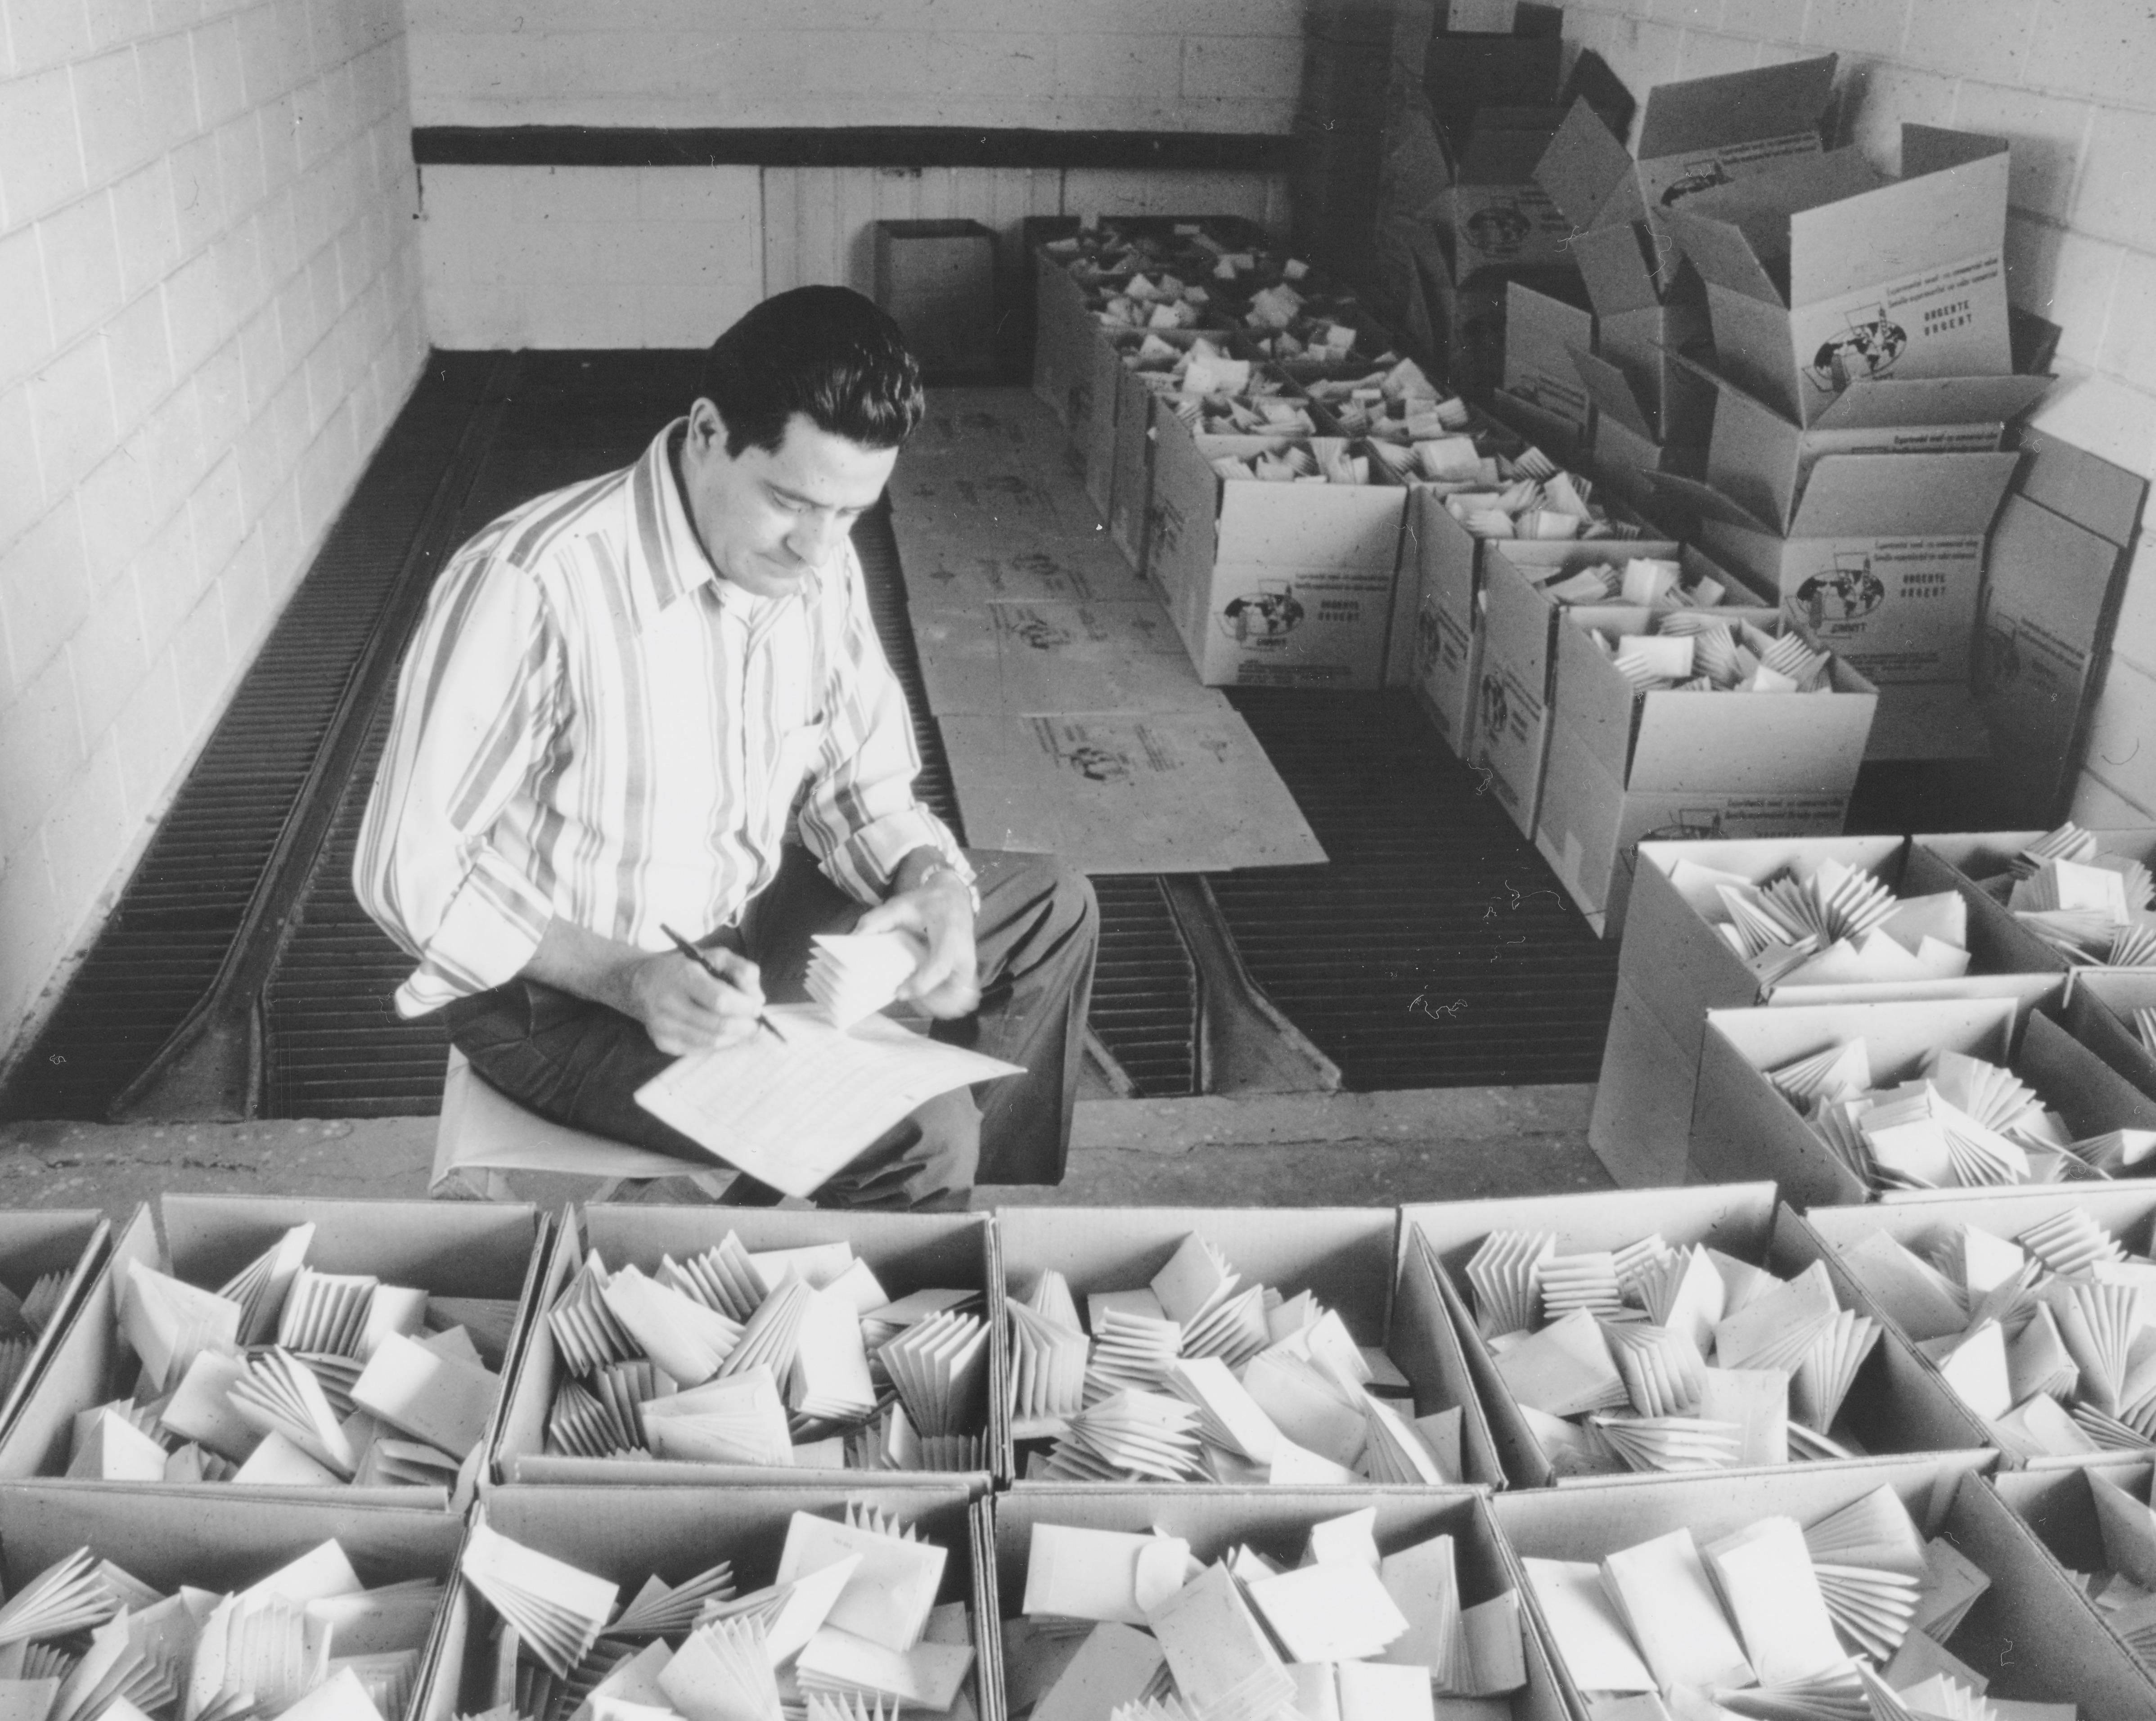 Maximino Alcalá de Stefano working at CIMMYT's wheat international nurseries. (Photo: CIMMYT)